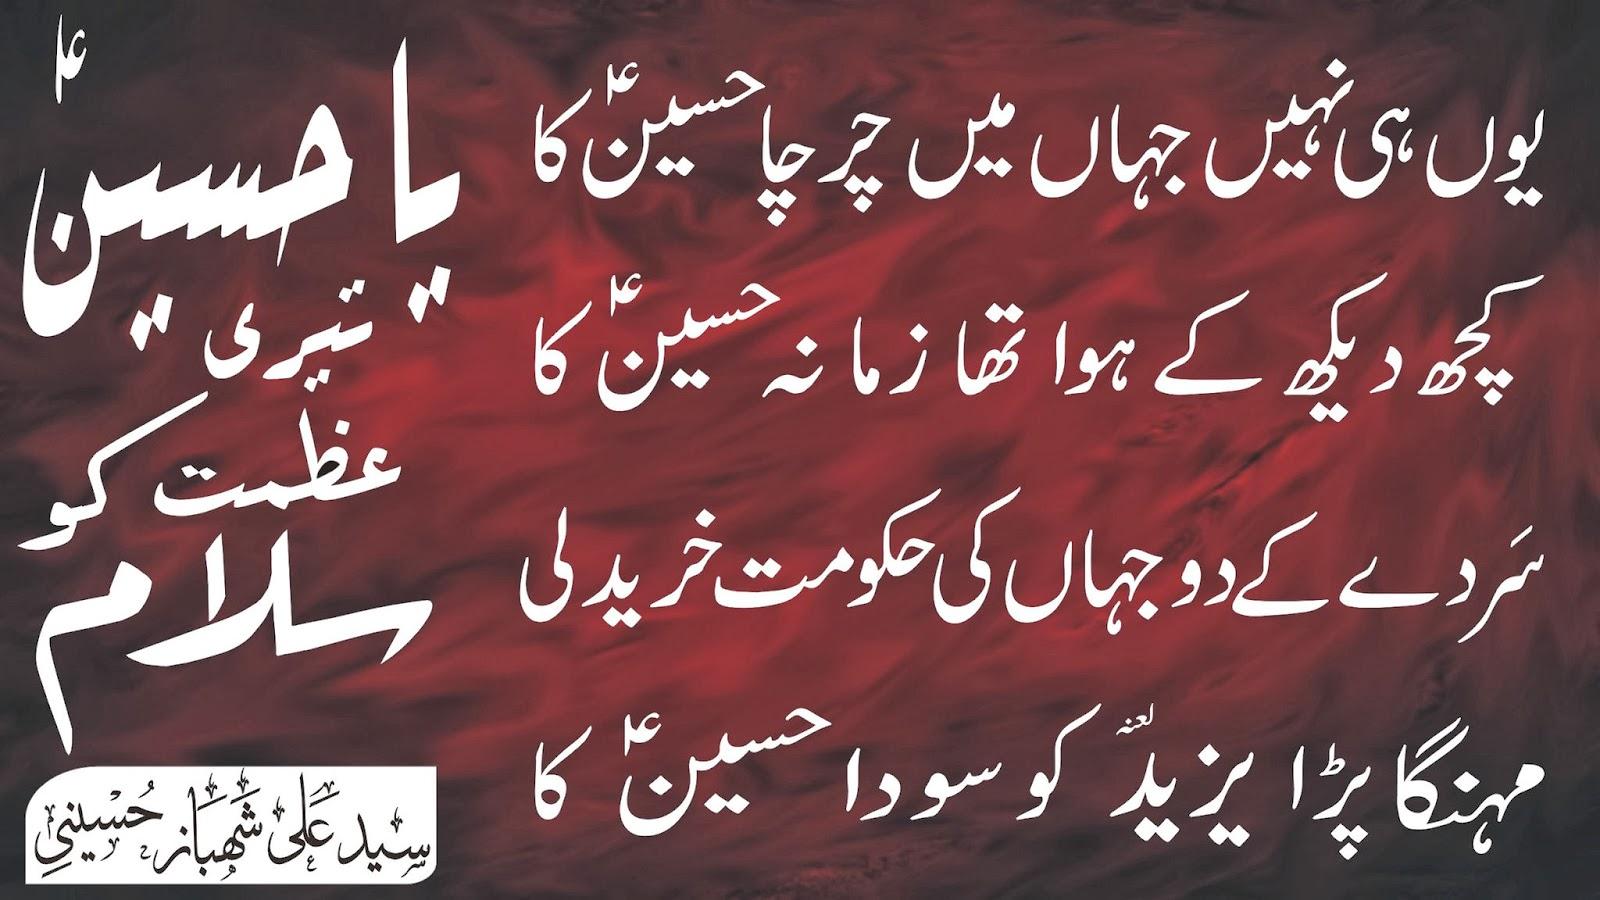 Ya hussain wallpaper 6